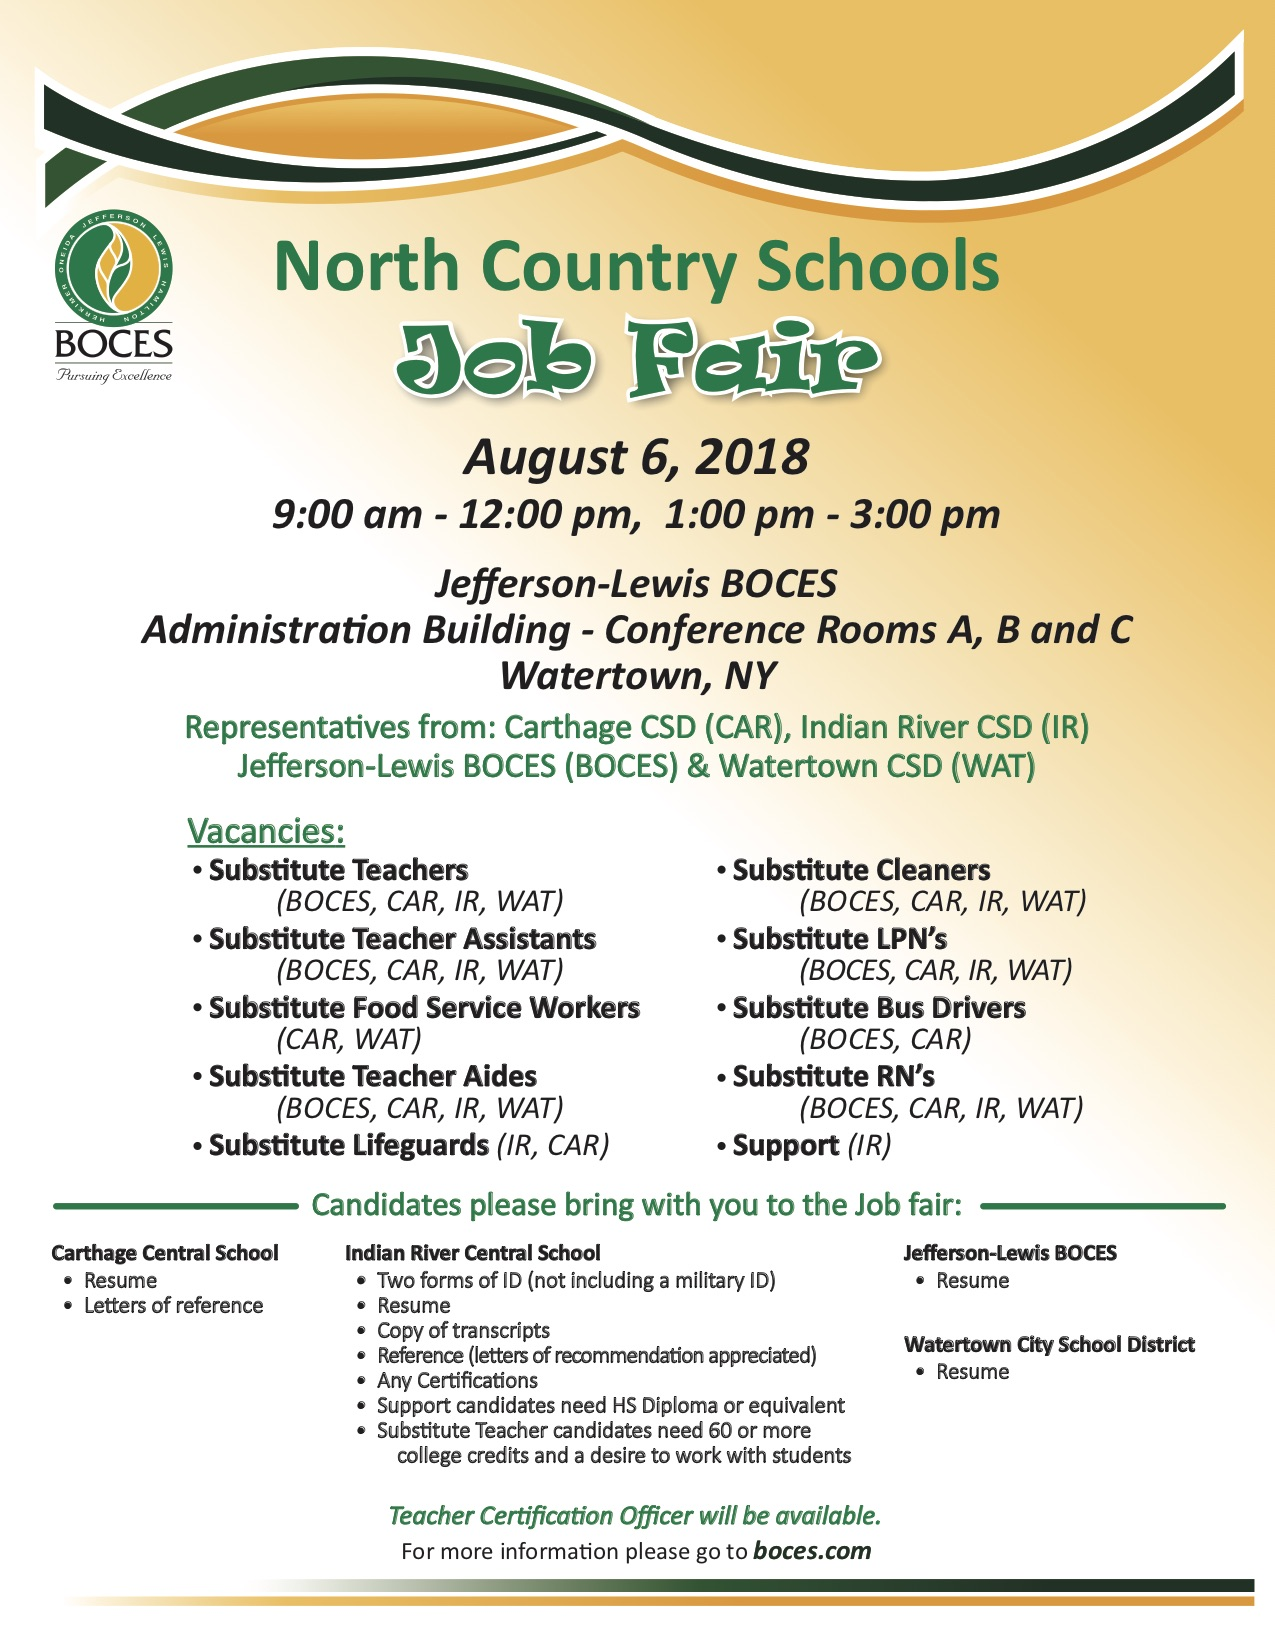 North Country Schools Job Fair_8-18_1532723804835.jpg.jpg